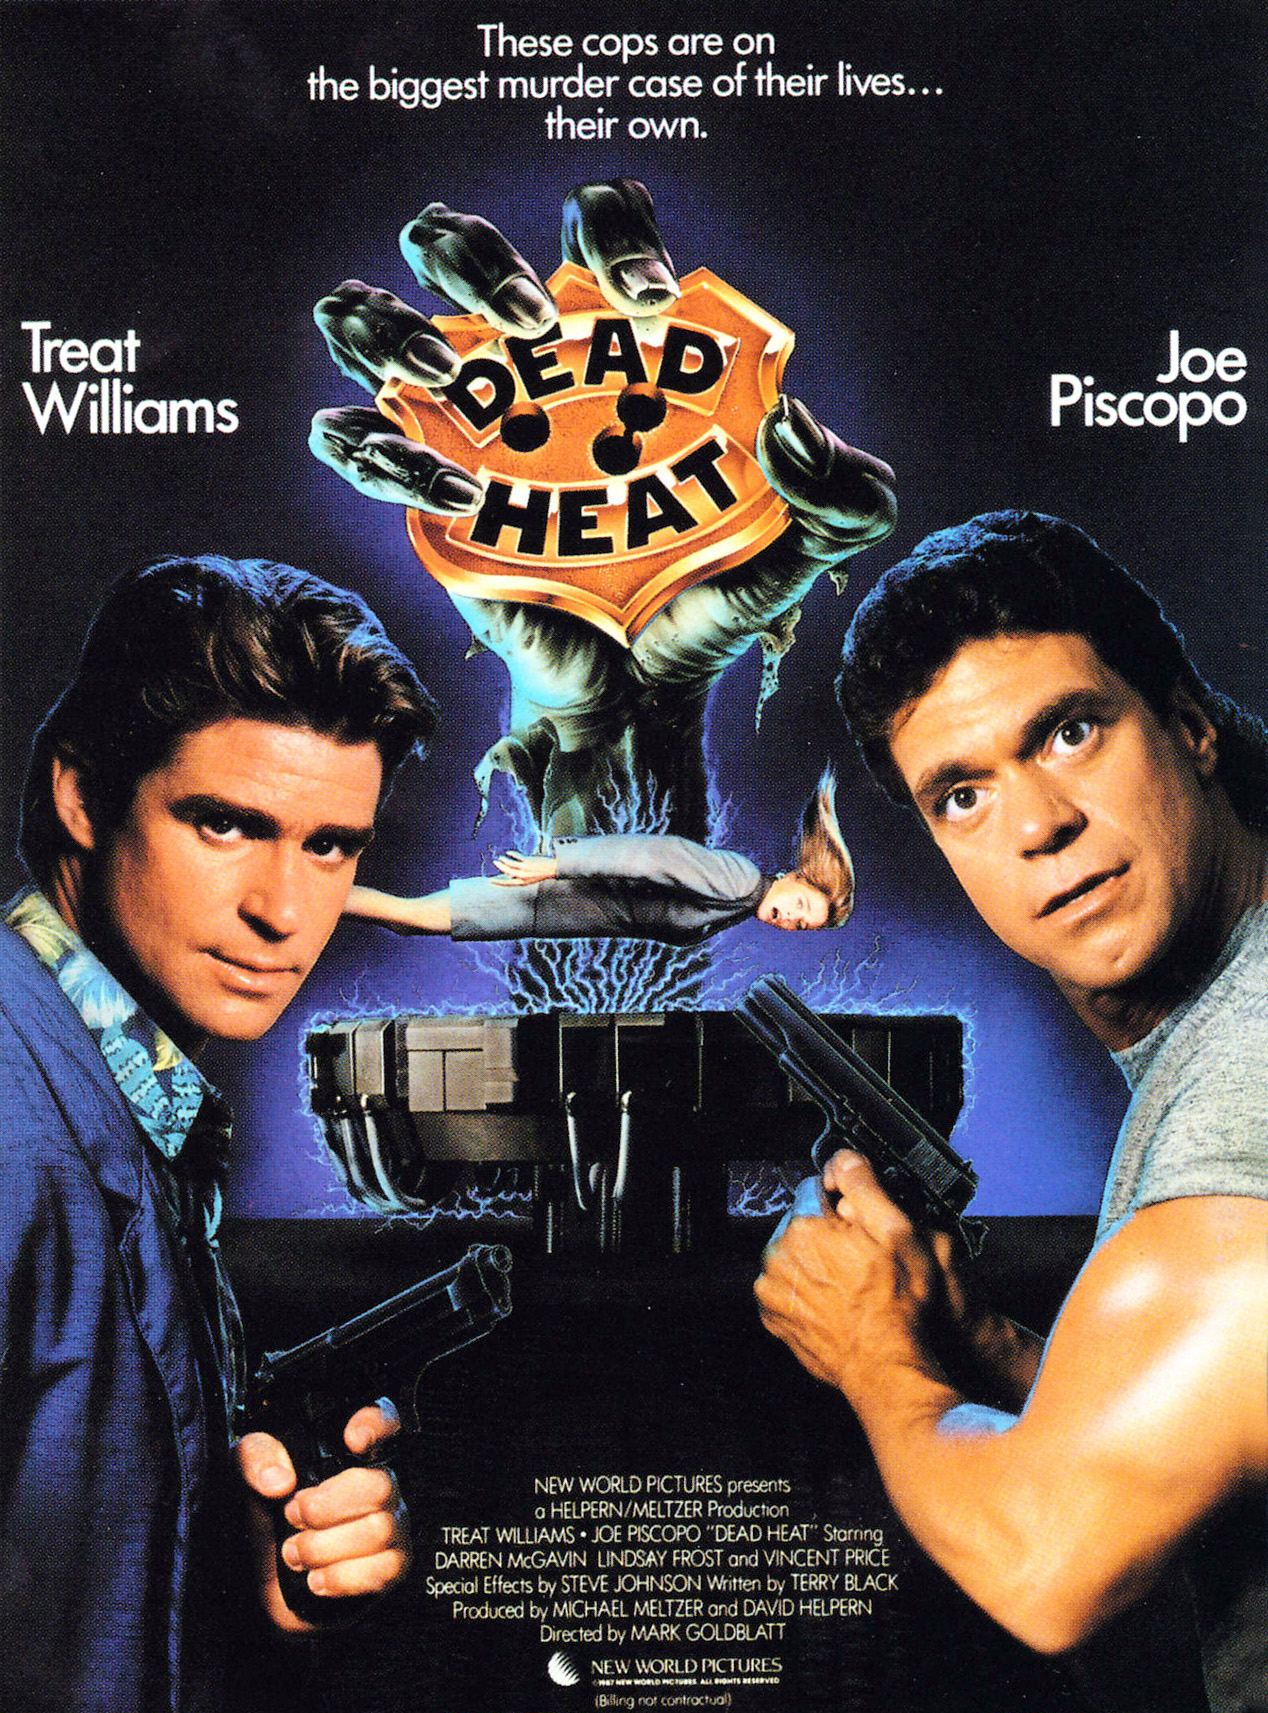 Dead Heat alternate poster